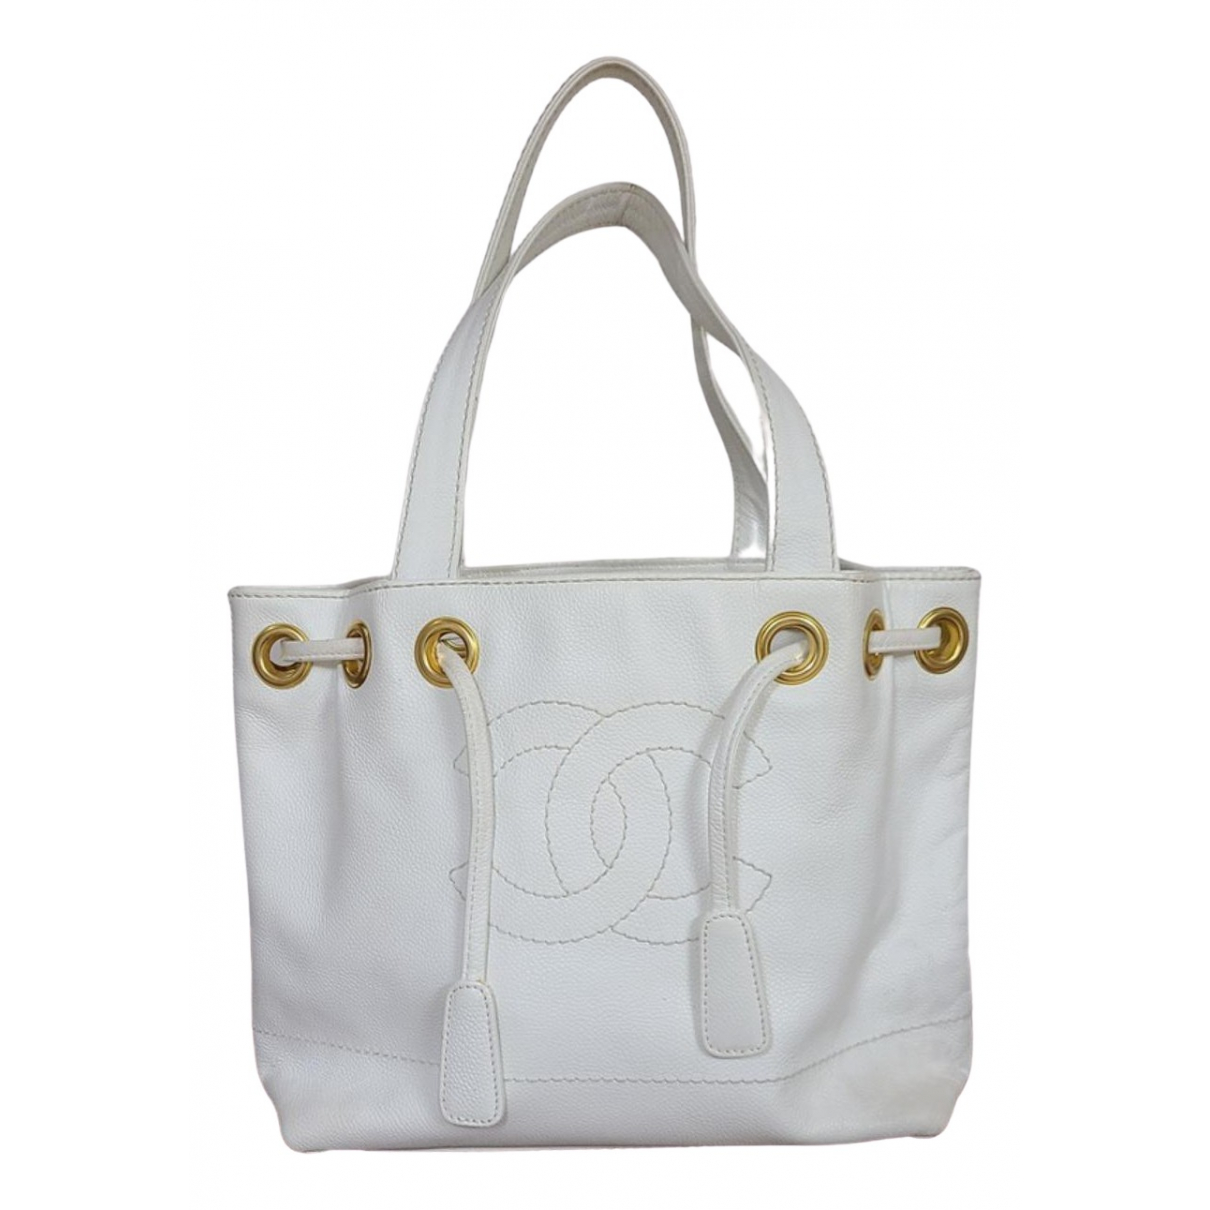 Chanel Petite Shopping Tote White Leather handbag for Women \N